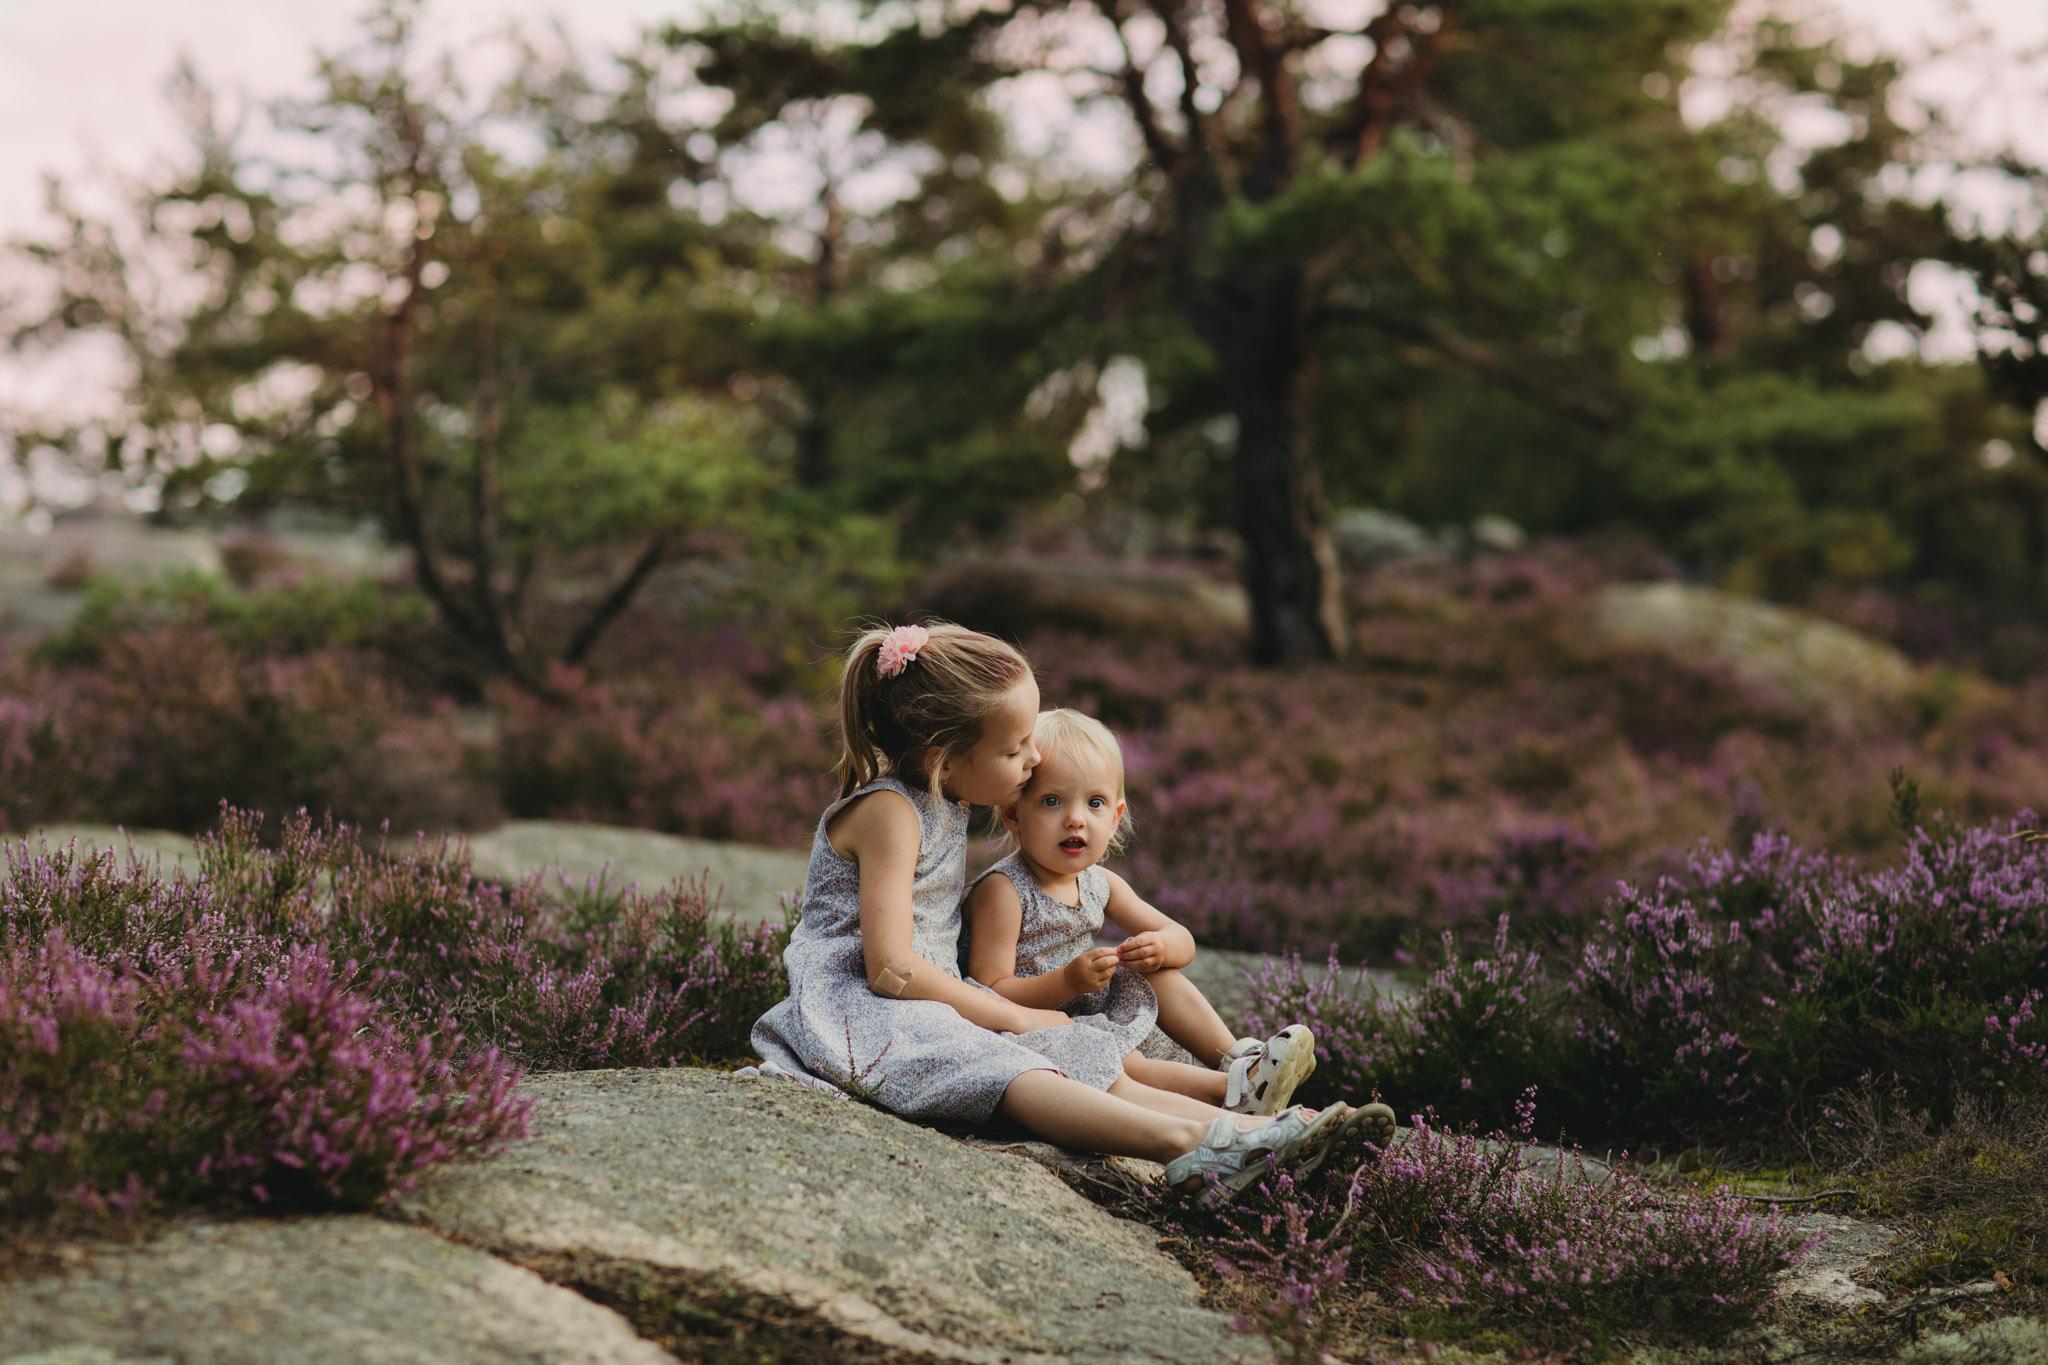 Barnefotografering - Natur, lyng - Fotograf Ida Hvattum